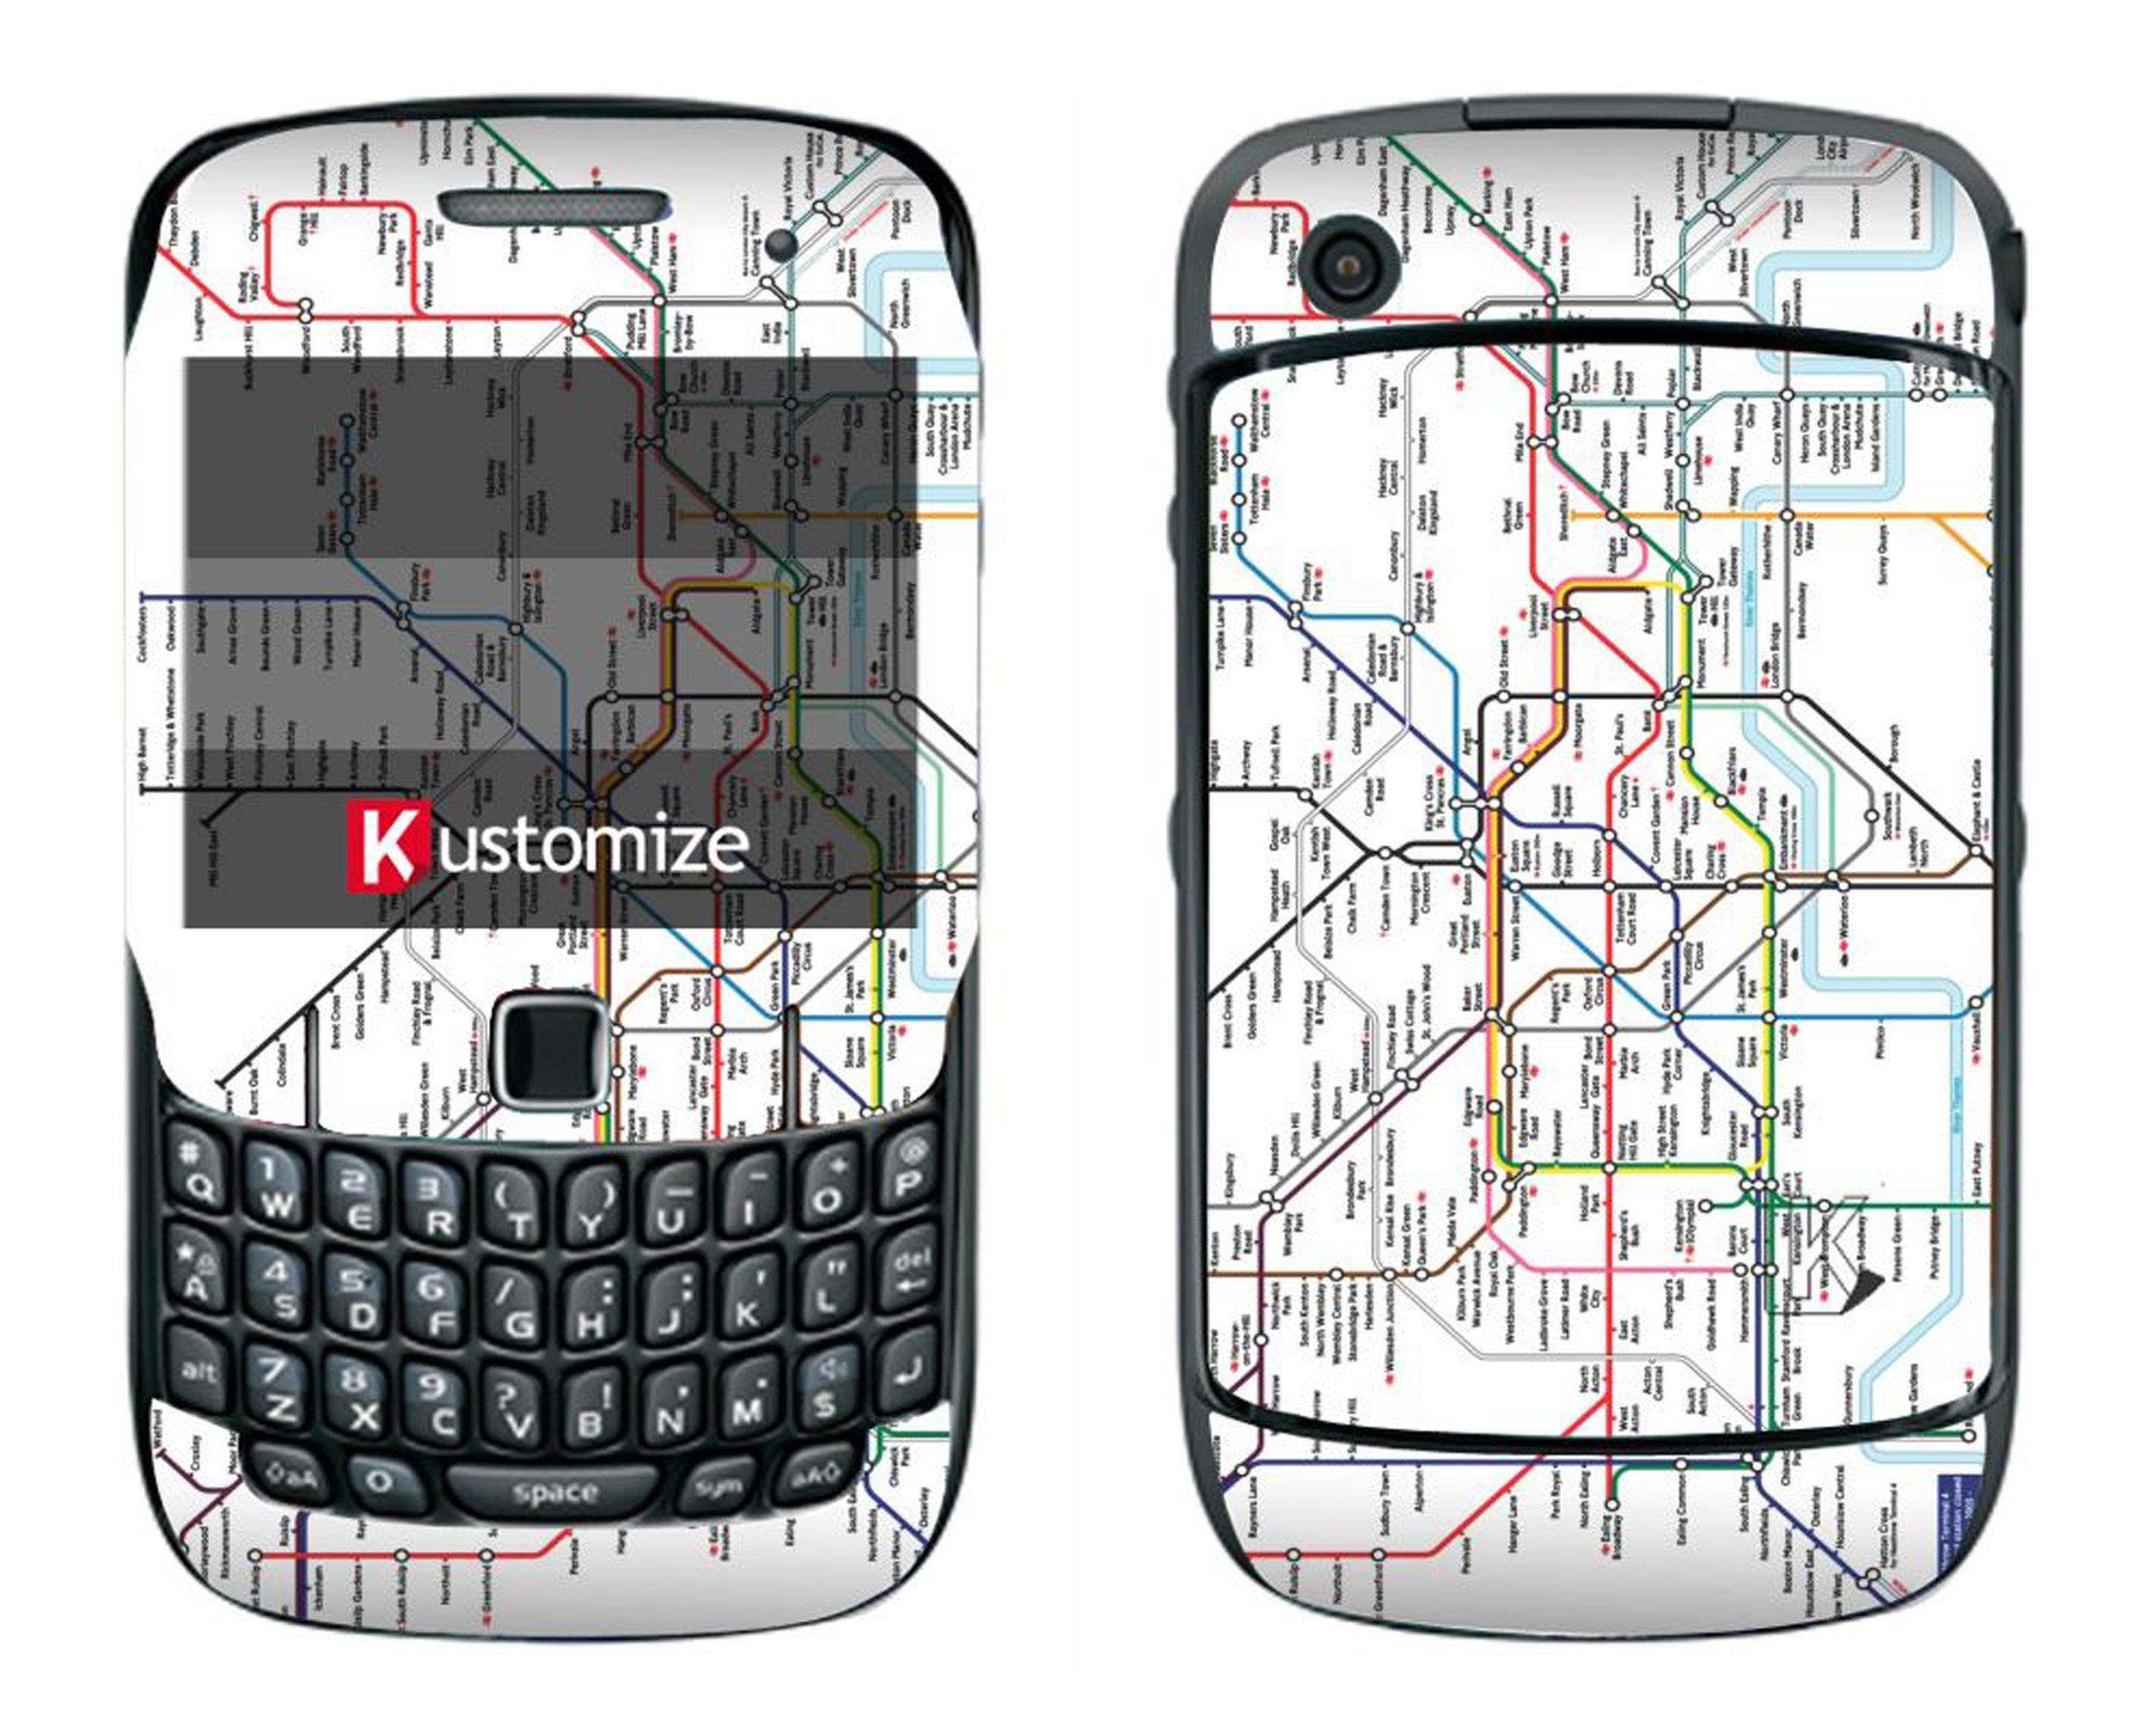 Skin para Blackberry 8520 - http://cafun.do/HNge6q R$24,90